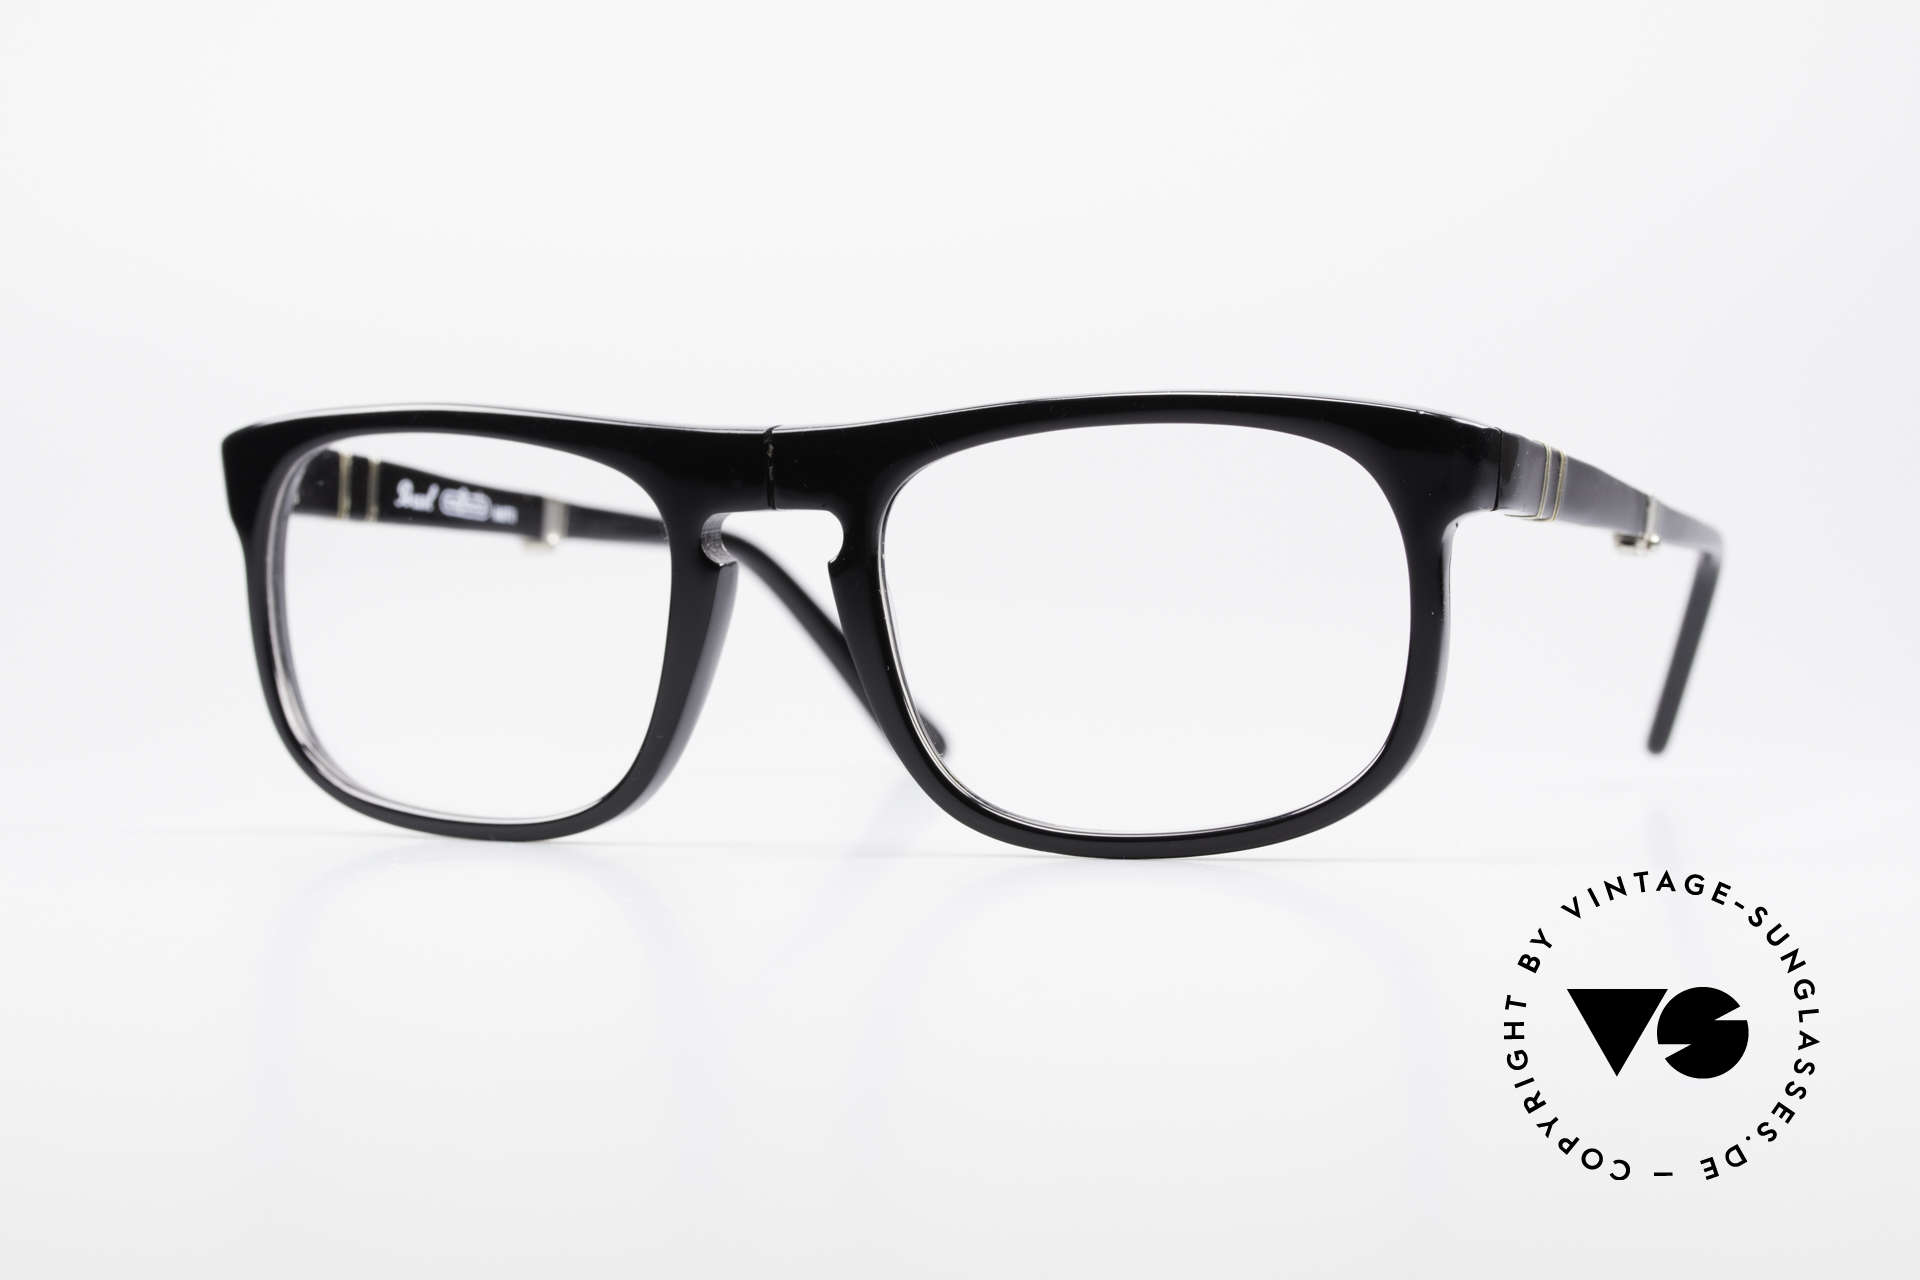 Persol Ratti 807 Folding Vintage Folding Eyeglasses, Persol 806 RATTI = legendary 70's folding eyeglasses, Made for Men